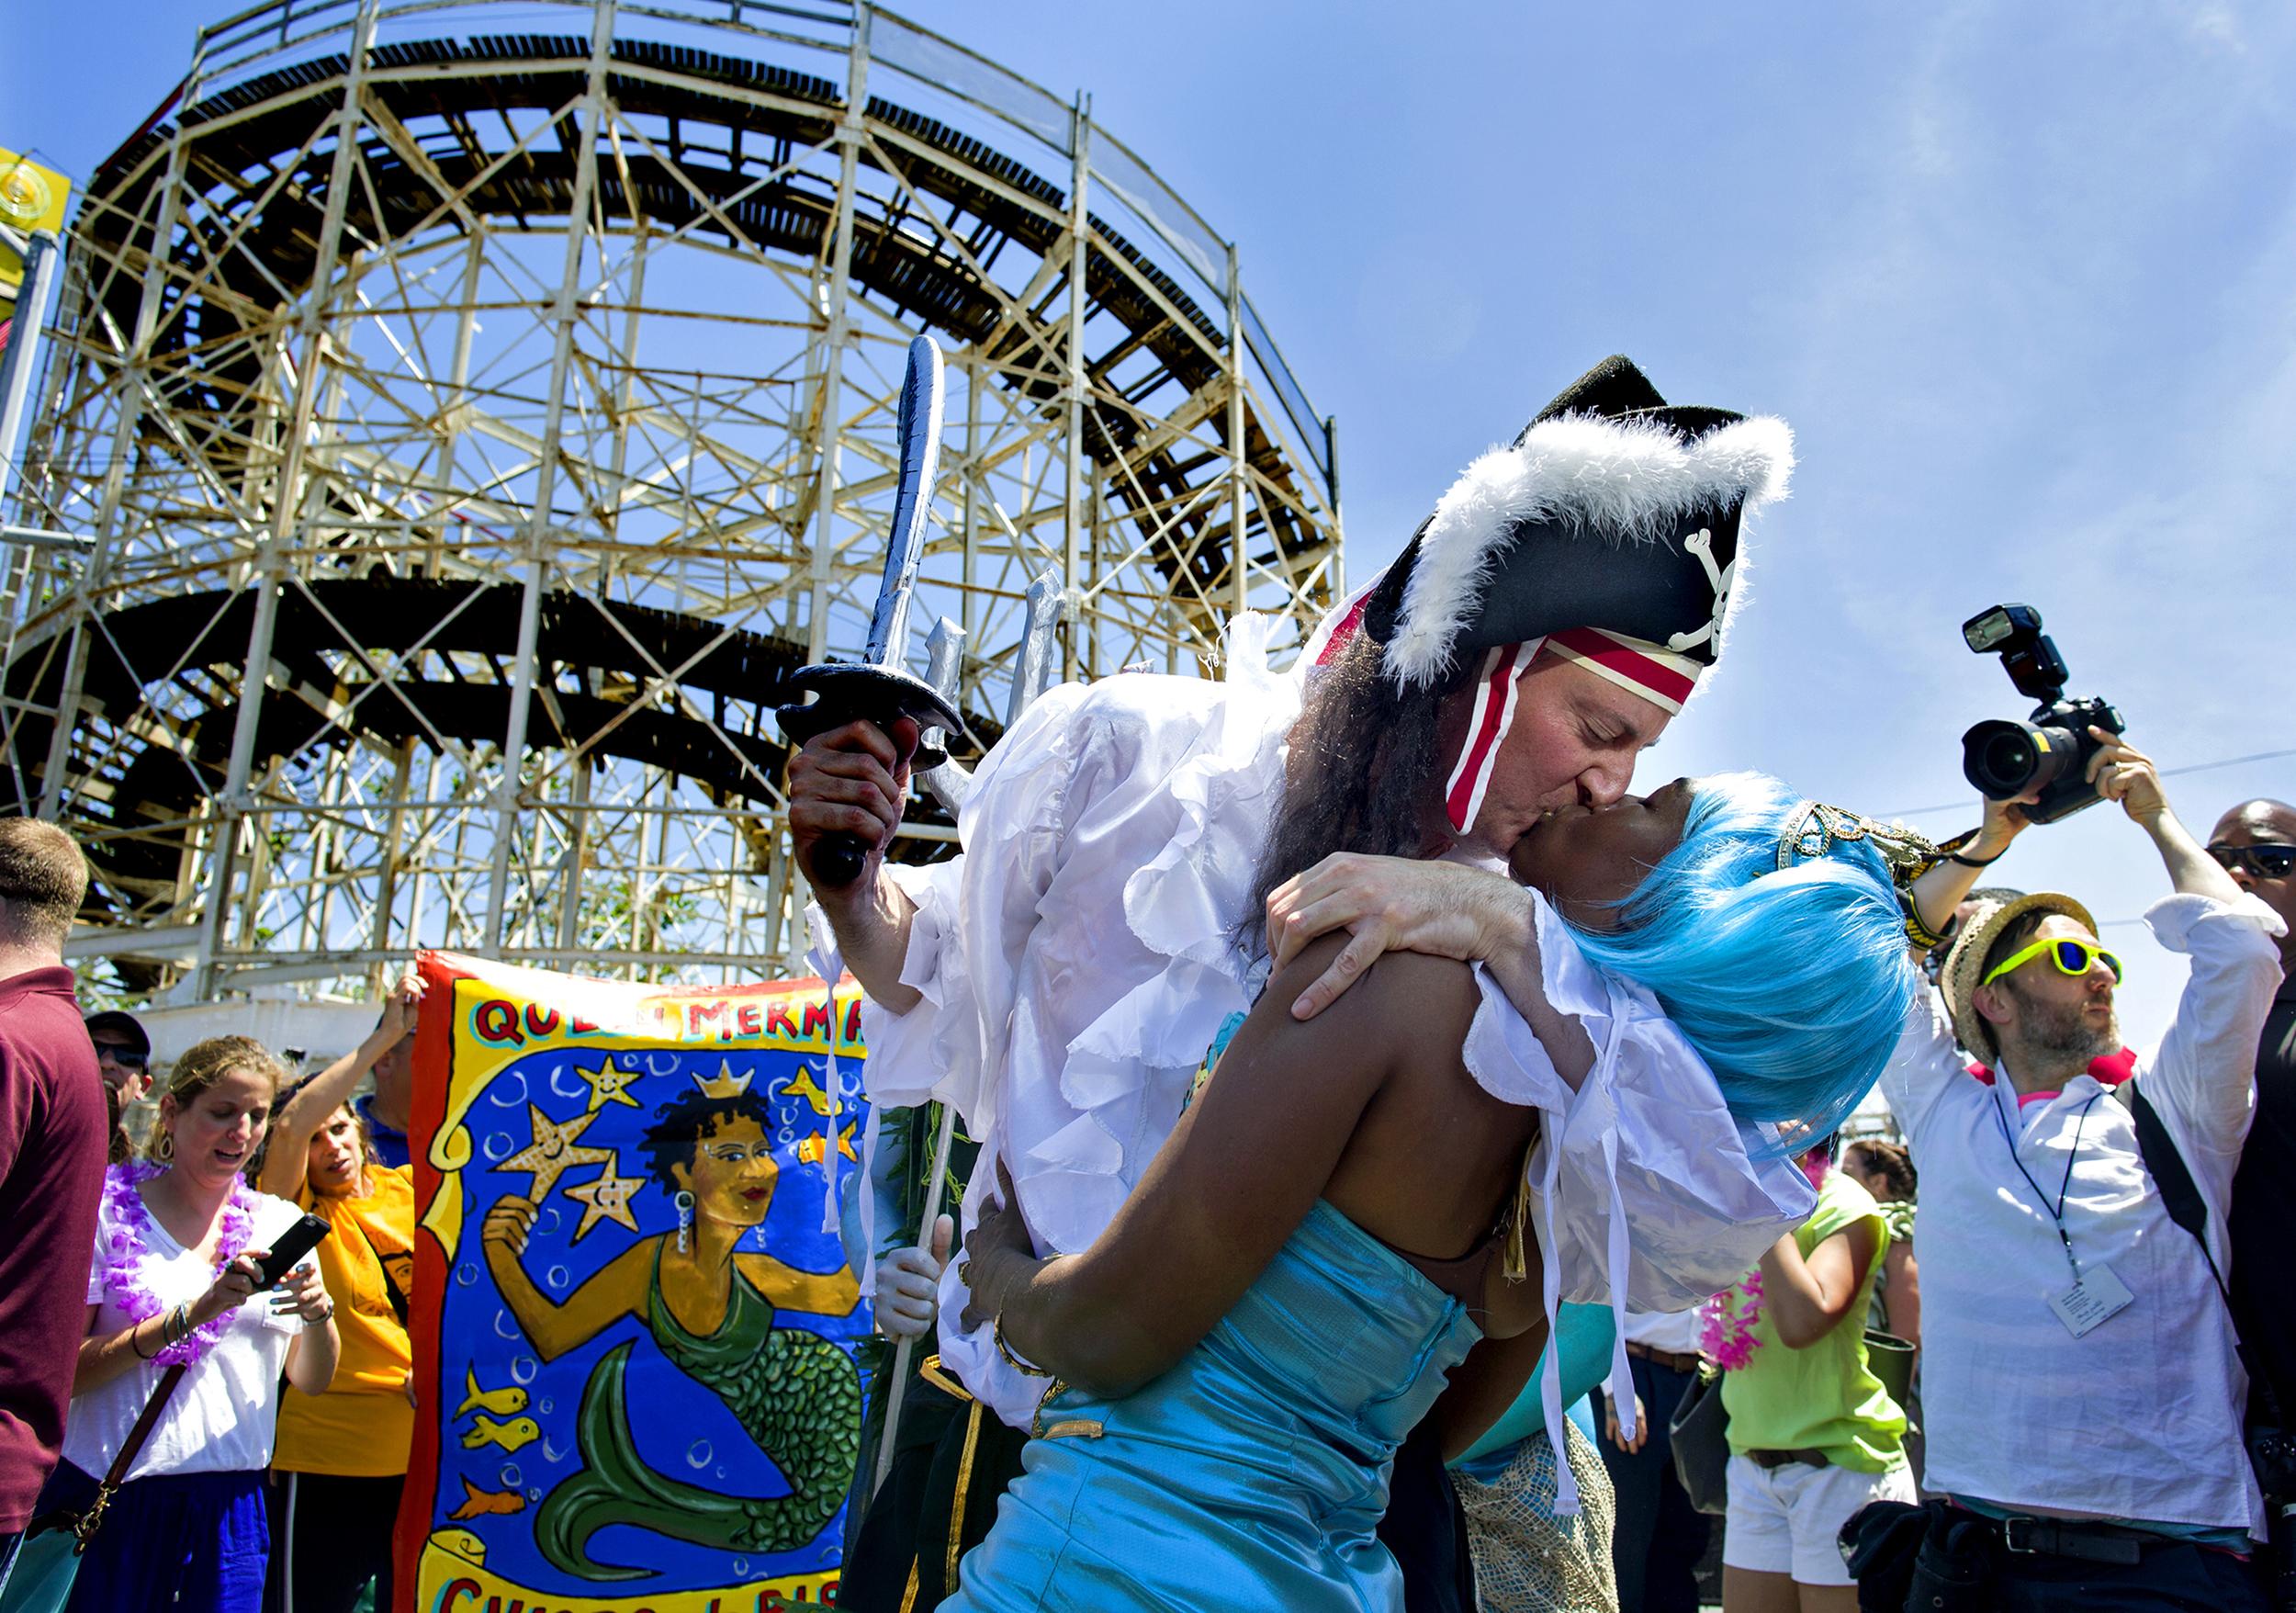 NYC Mayor Bill de Blasio kisses wife Chirlane McCray at Mermaid Parade, Coney Island, 2014